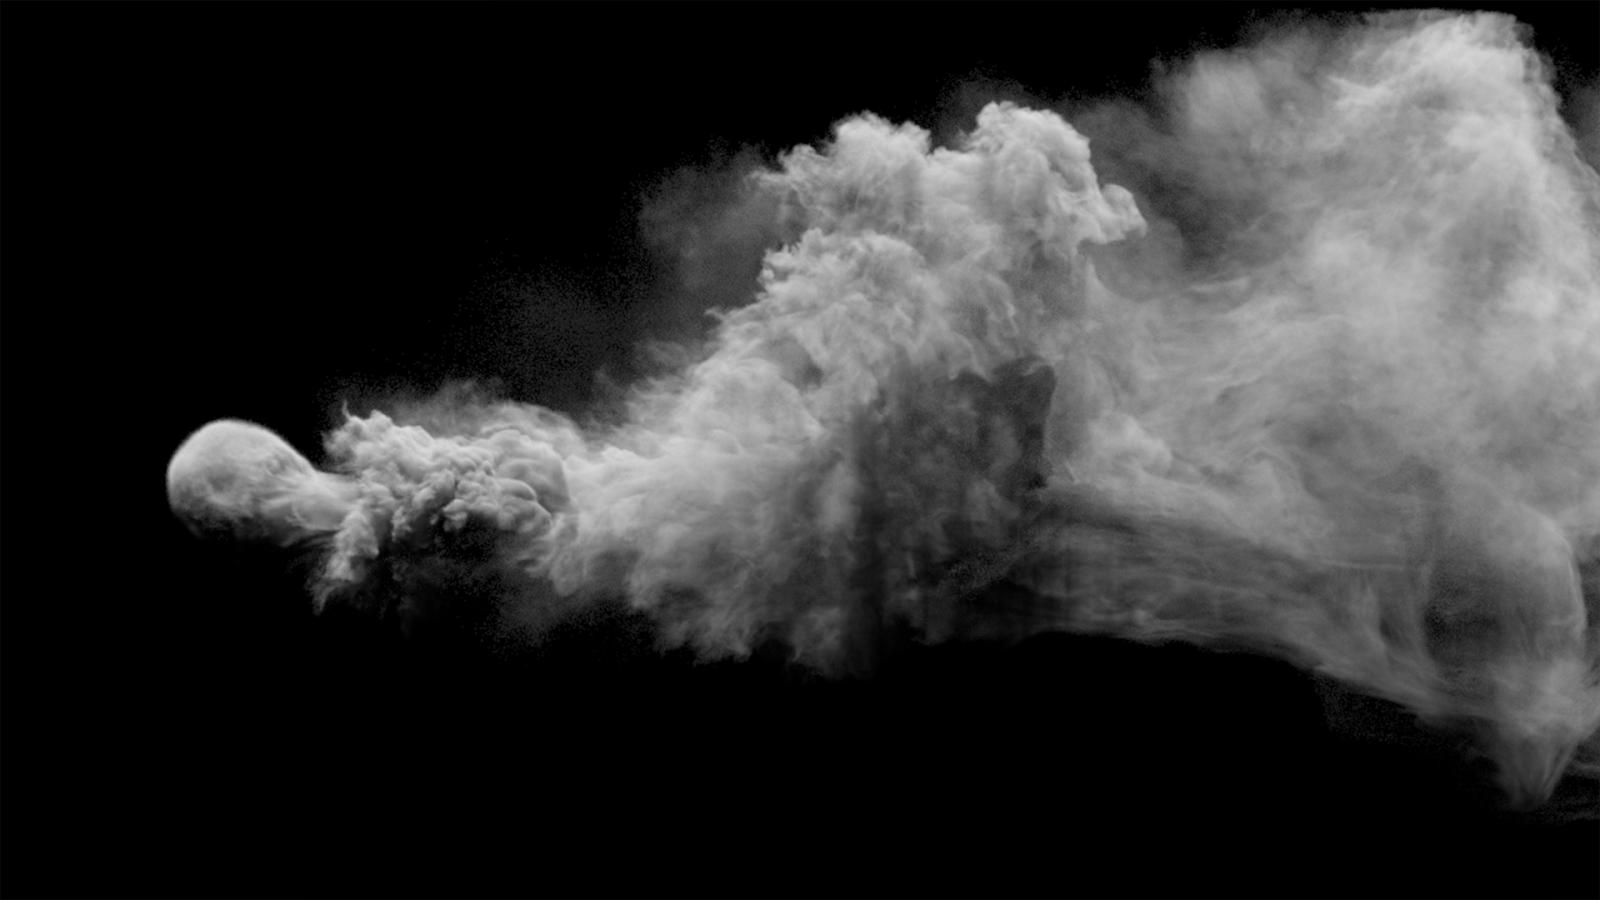 Hd smoke png (6), Smoke HD PNG - Free PNG